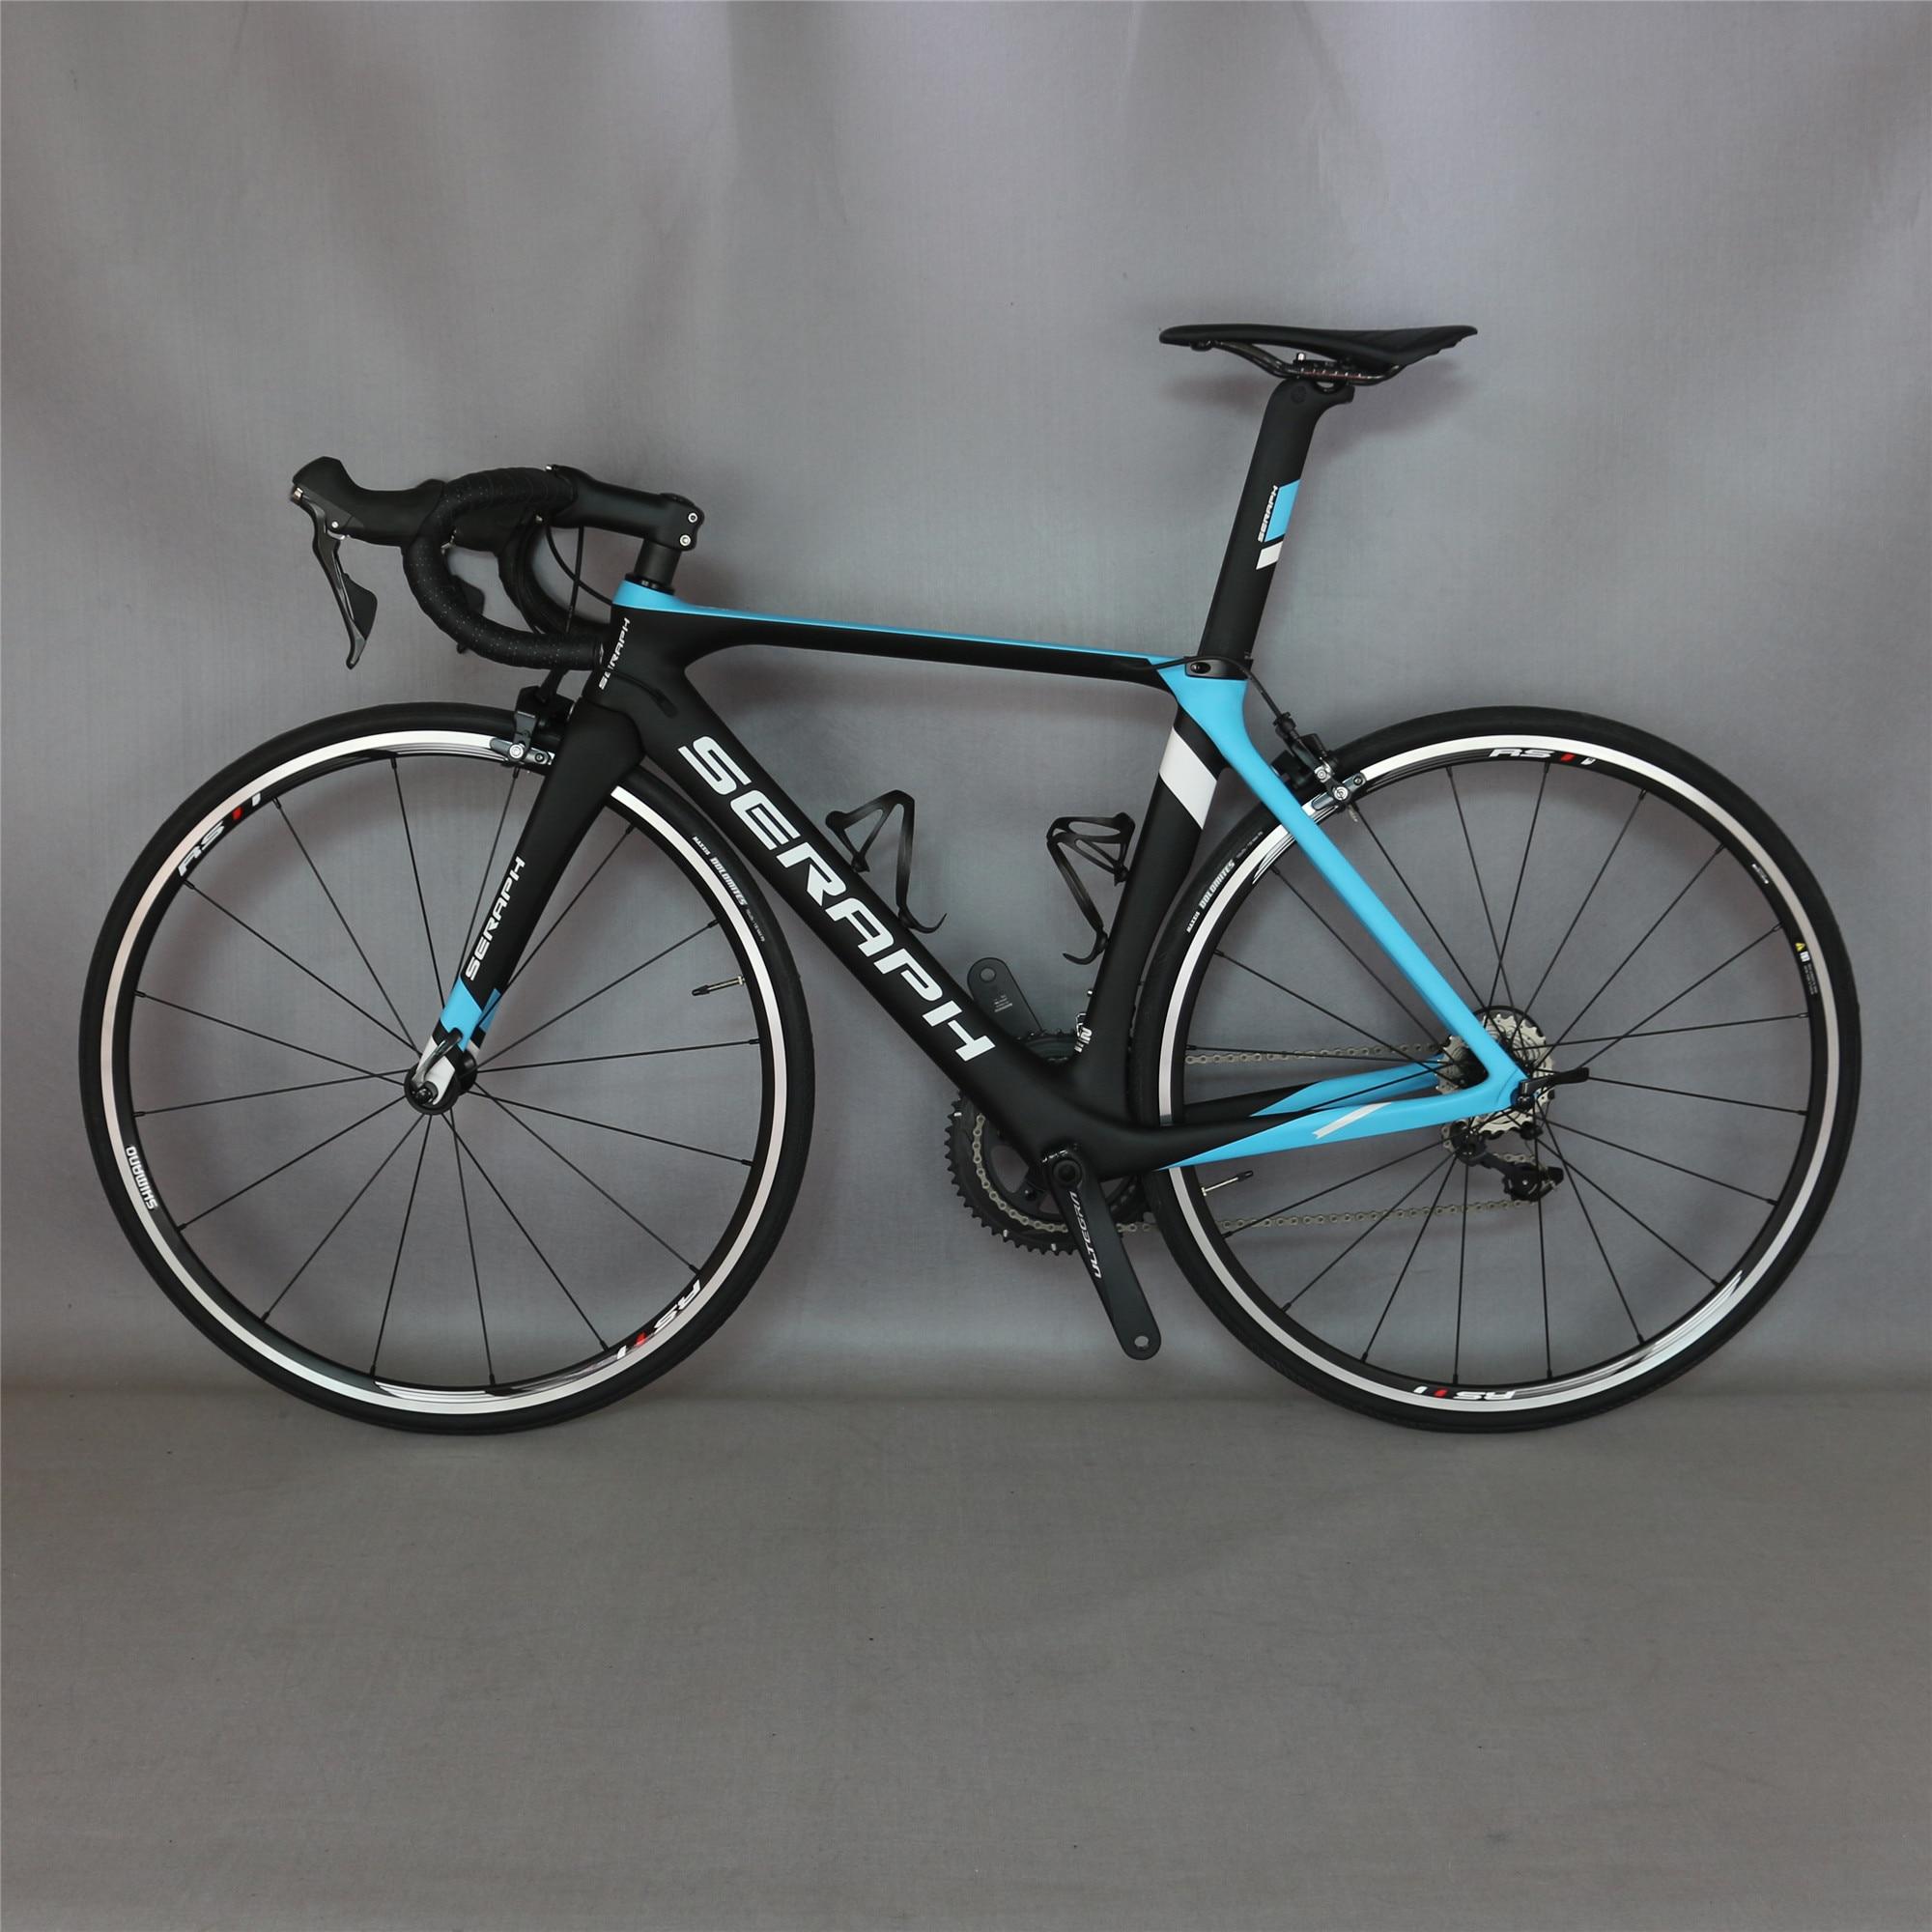 Seraph Custom Paint FM268 Aero Design Complete Bike 50.5/53.5/56.5cm  With SHIMNA00 R7000 Groupset